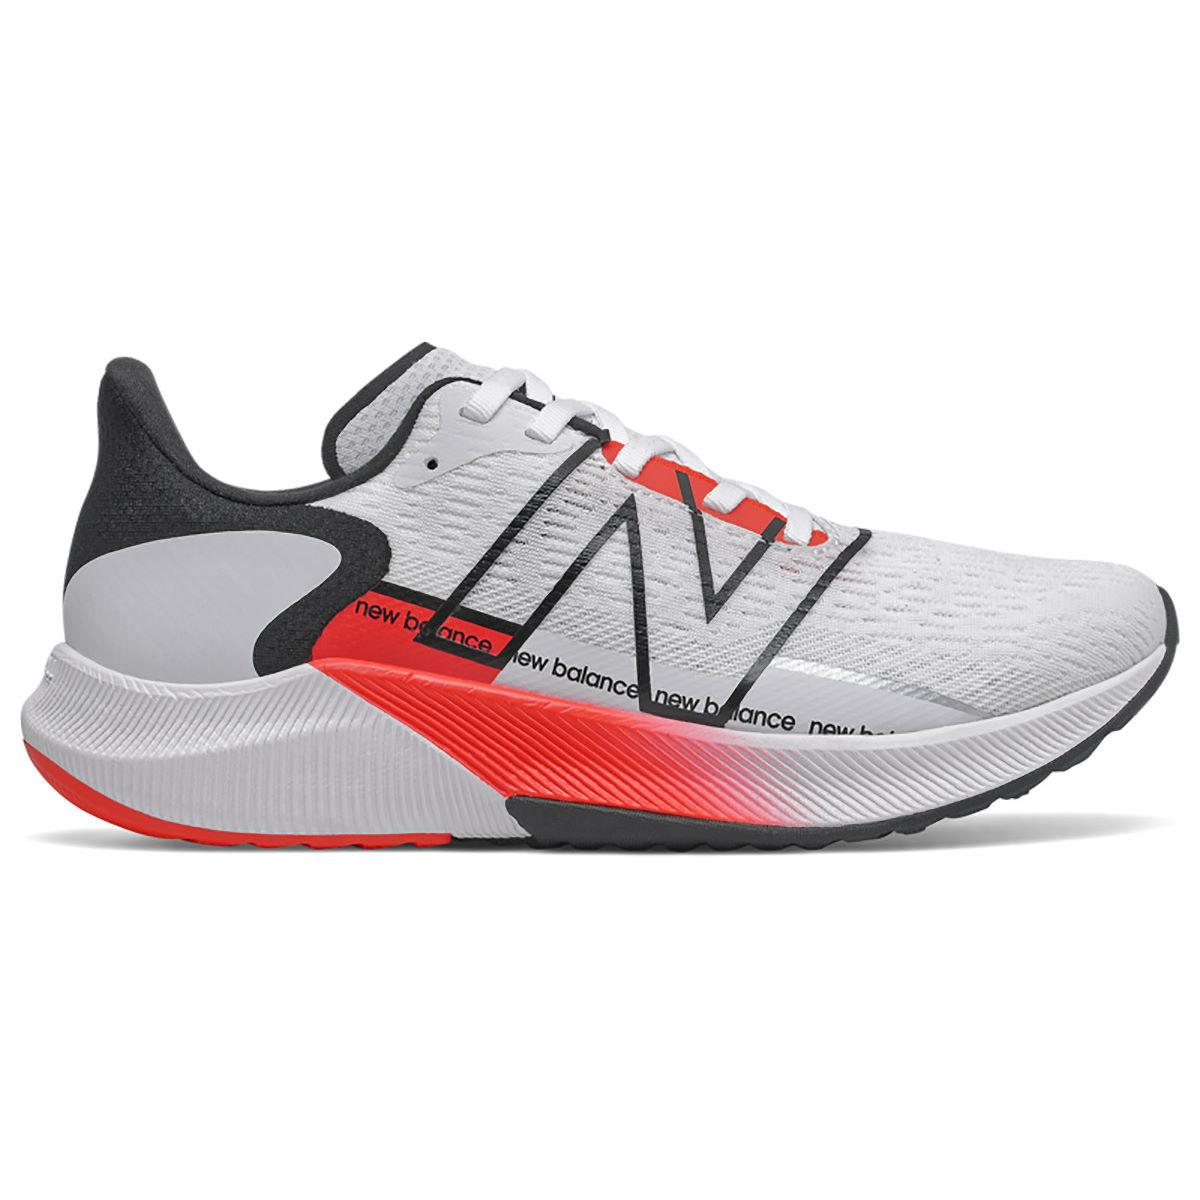 New Balance Fuelcell Propel · Producto New Balance · Calzado Running Mujer · Kukimbia Shop - Tienda Online Trail & Running